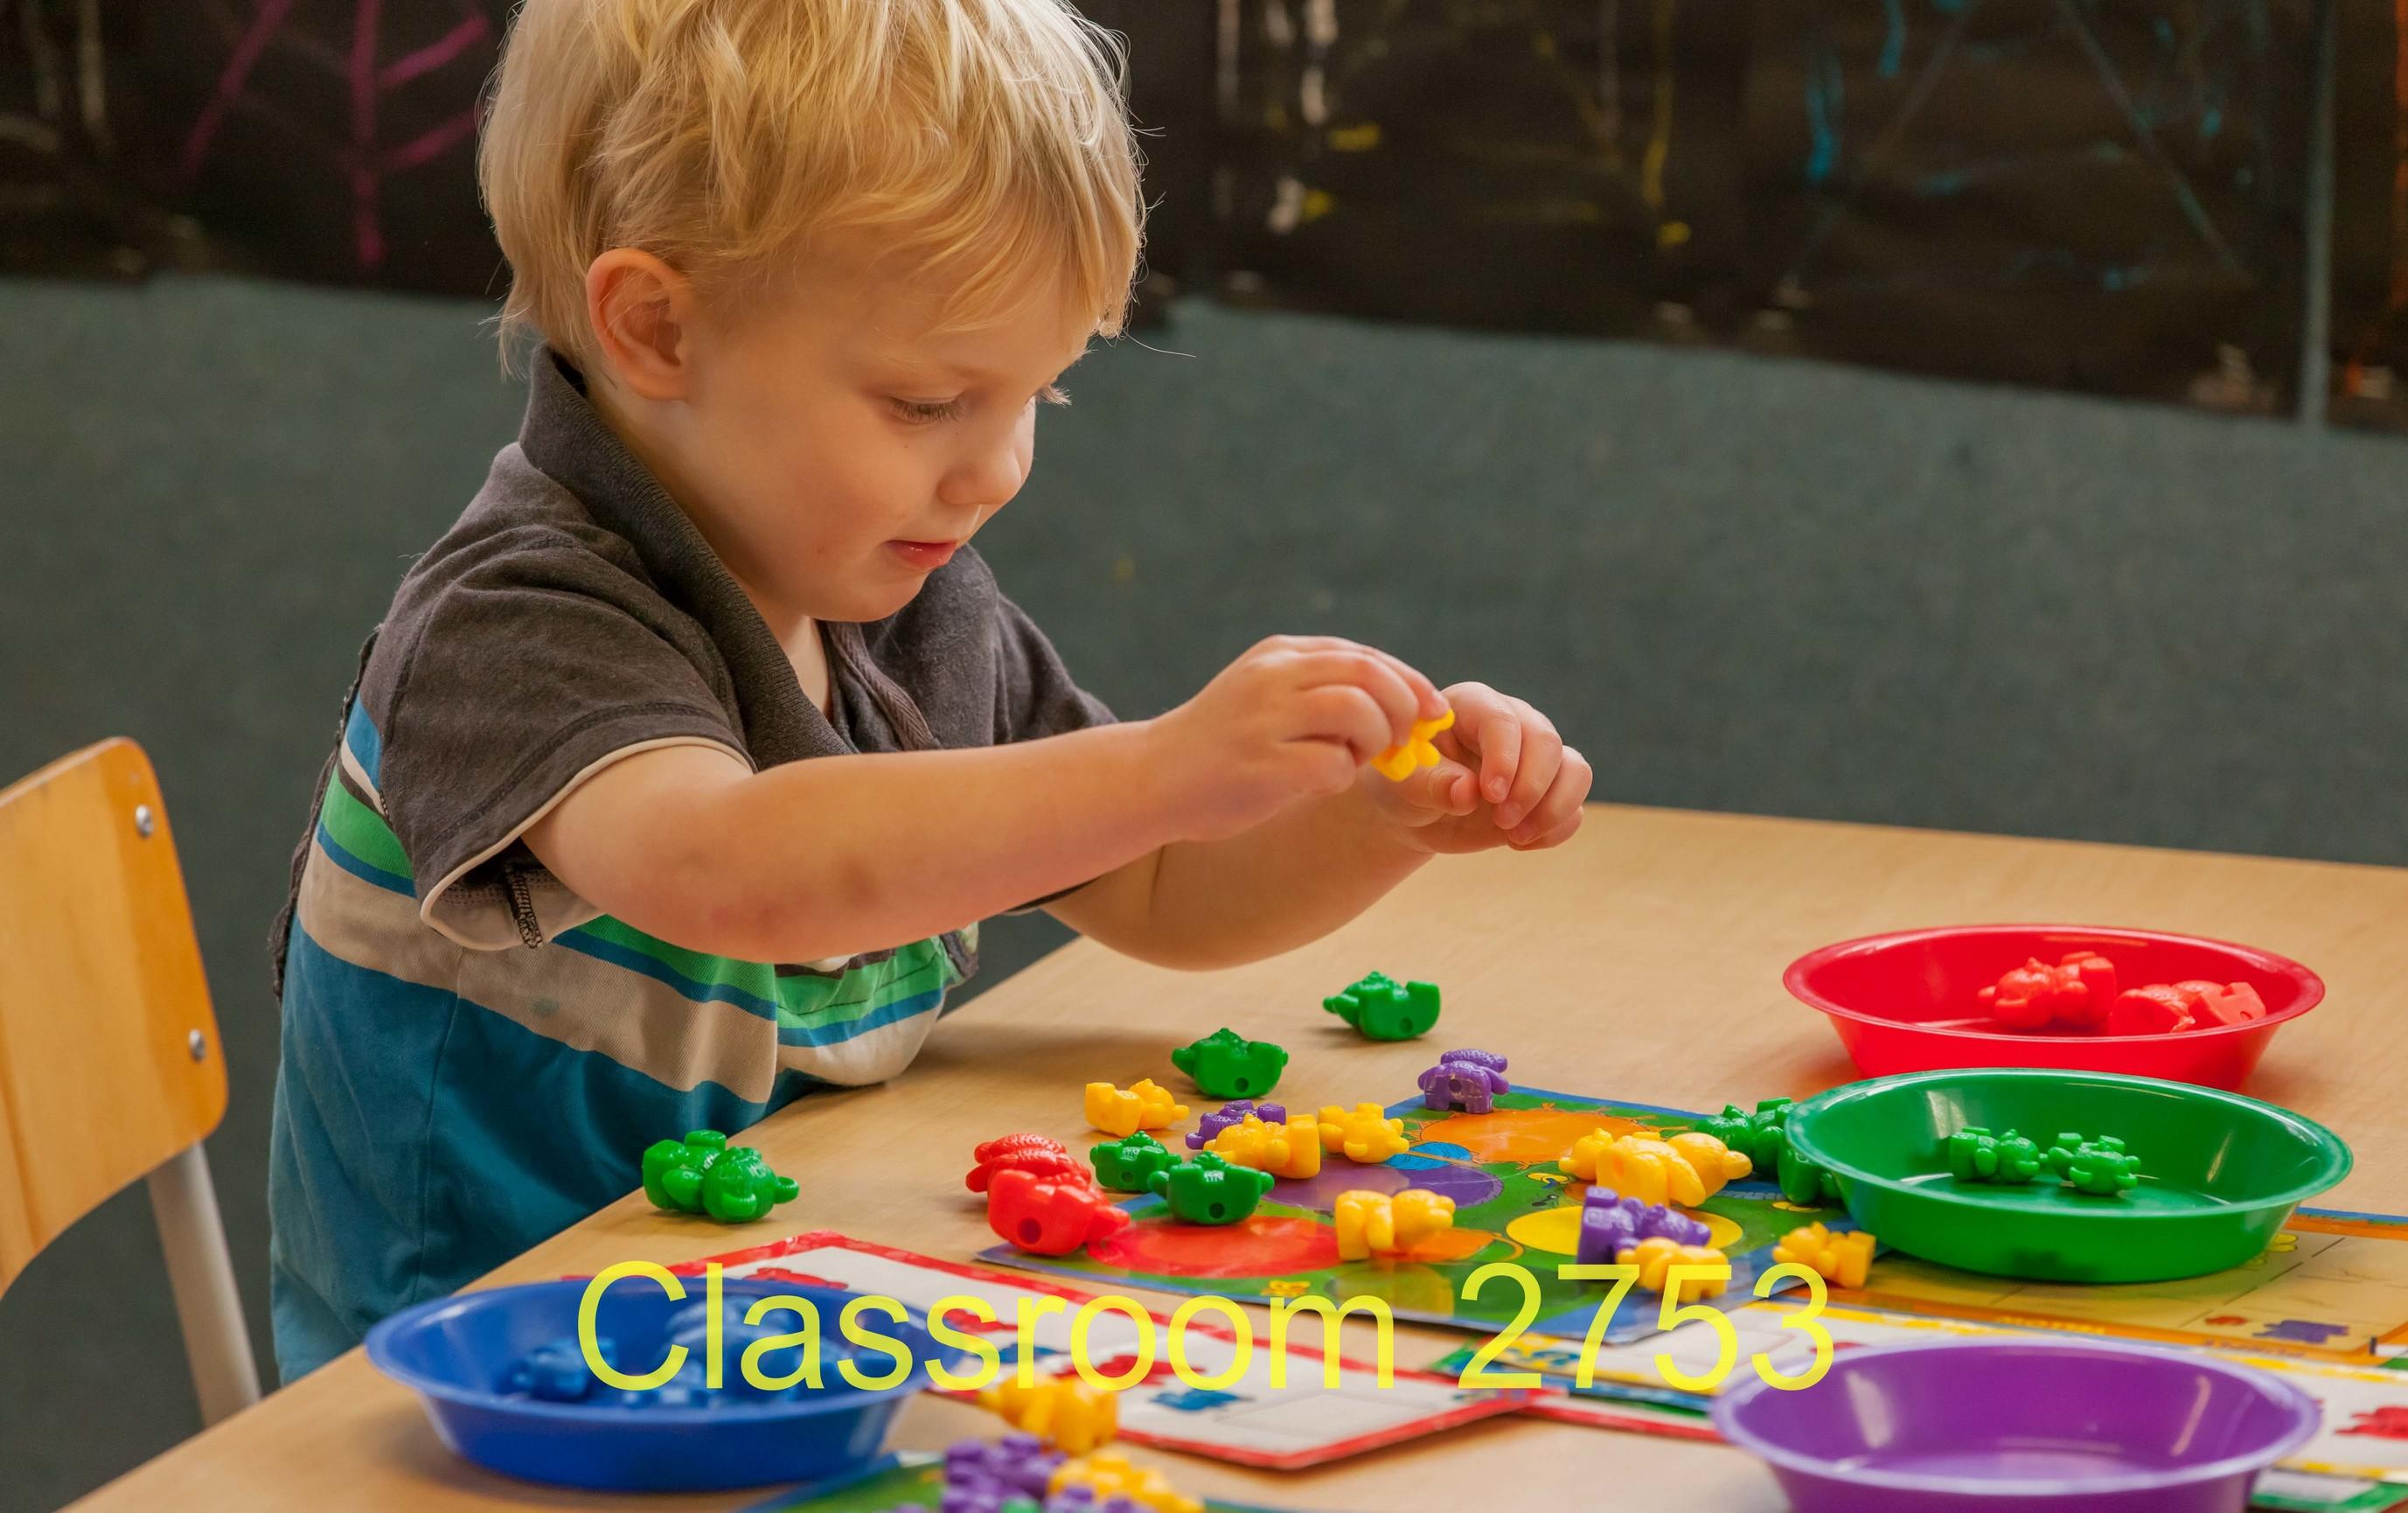 Classroom 2753